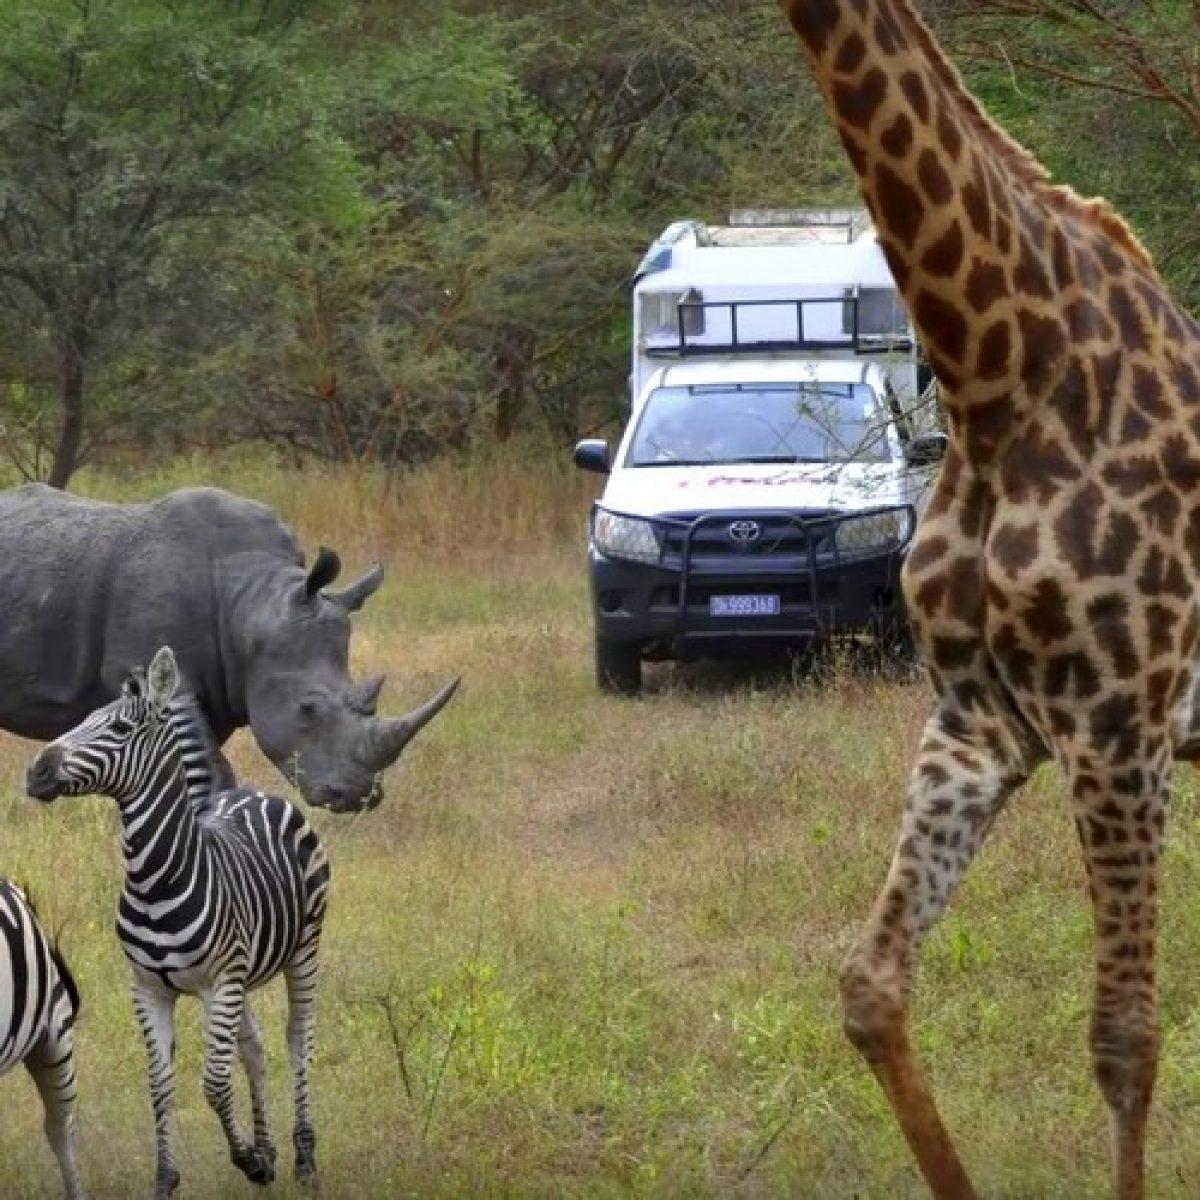 The Bandia Animal Reserve - 1/2 Day